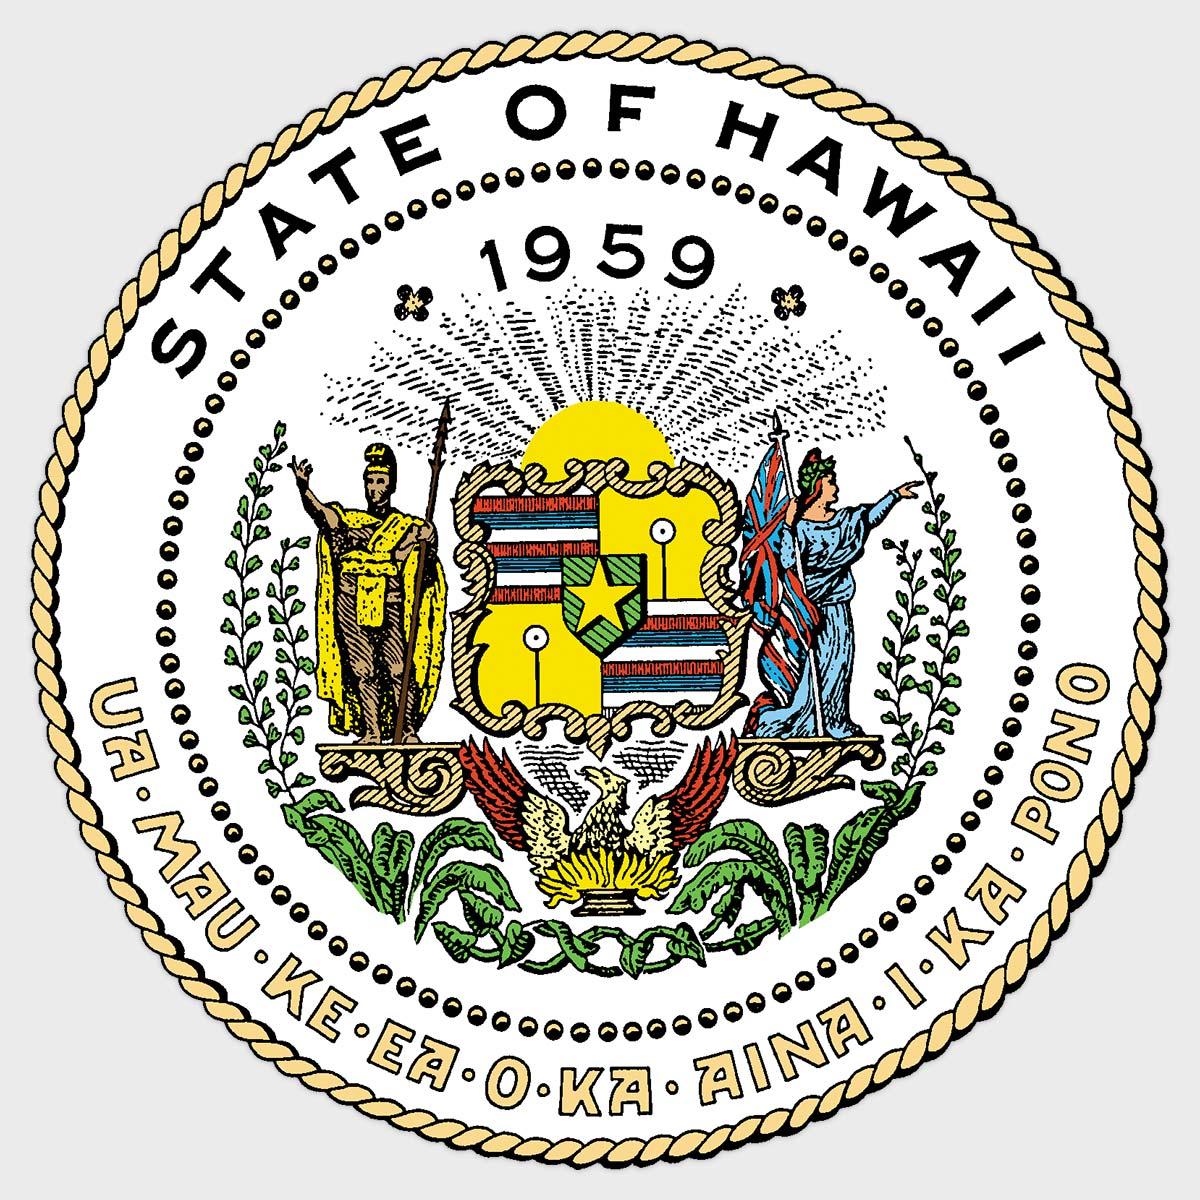 og image - Hawaii Board Of Nursing Application Status